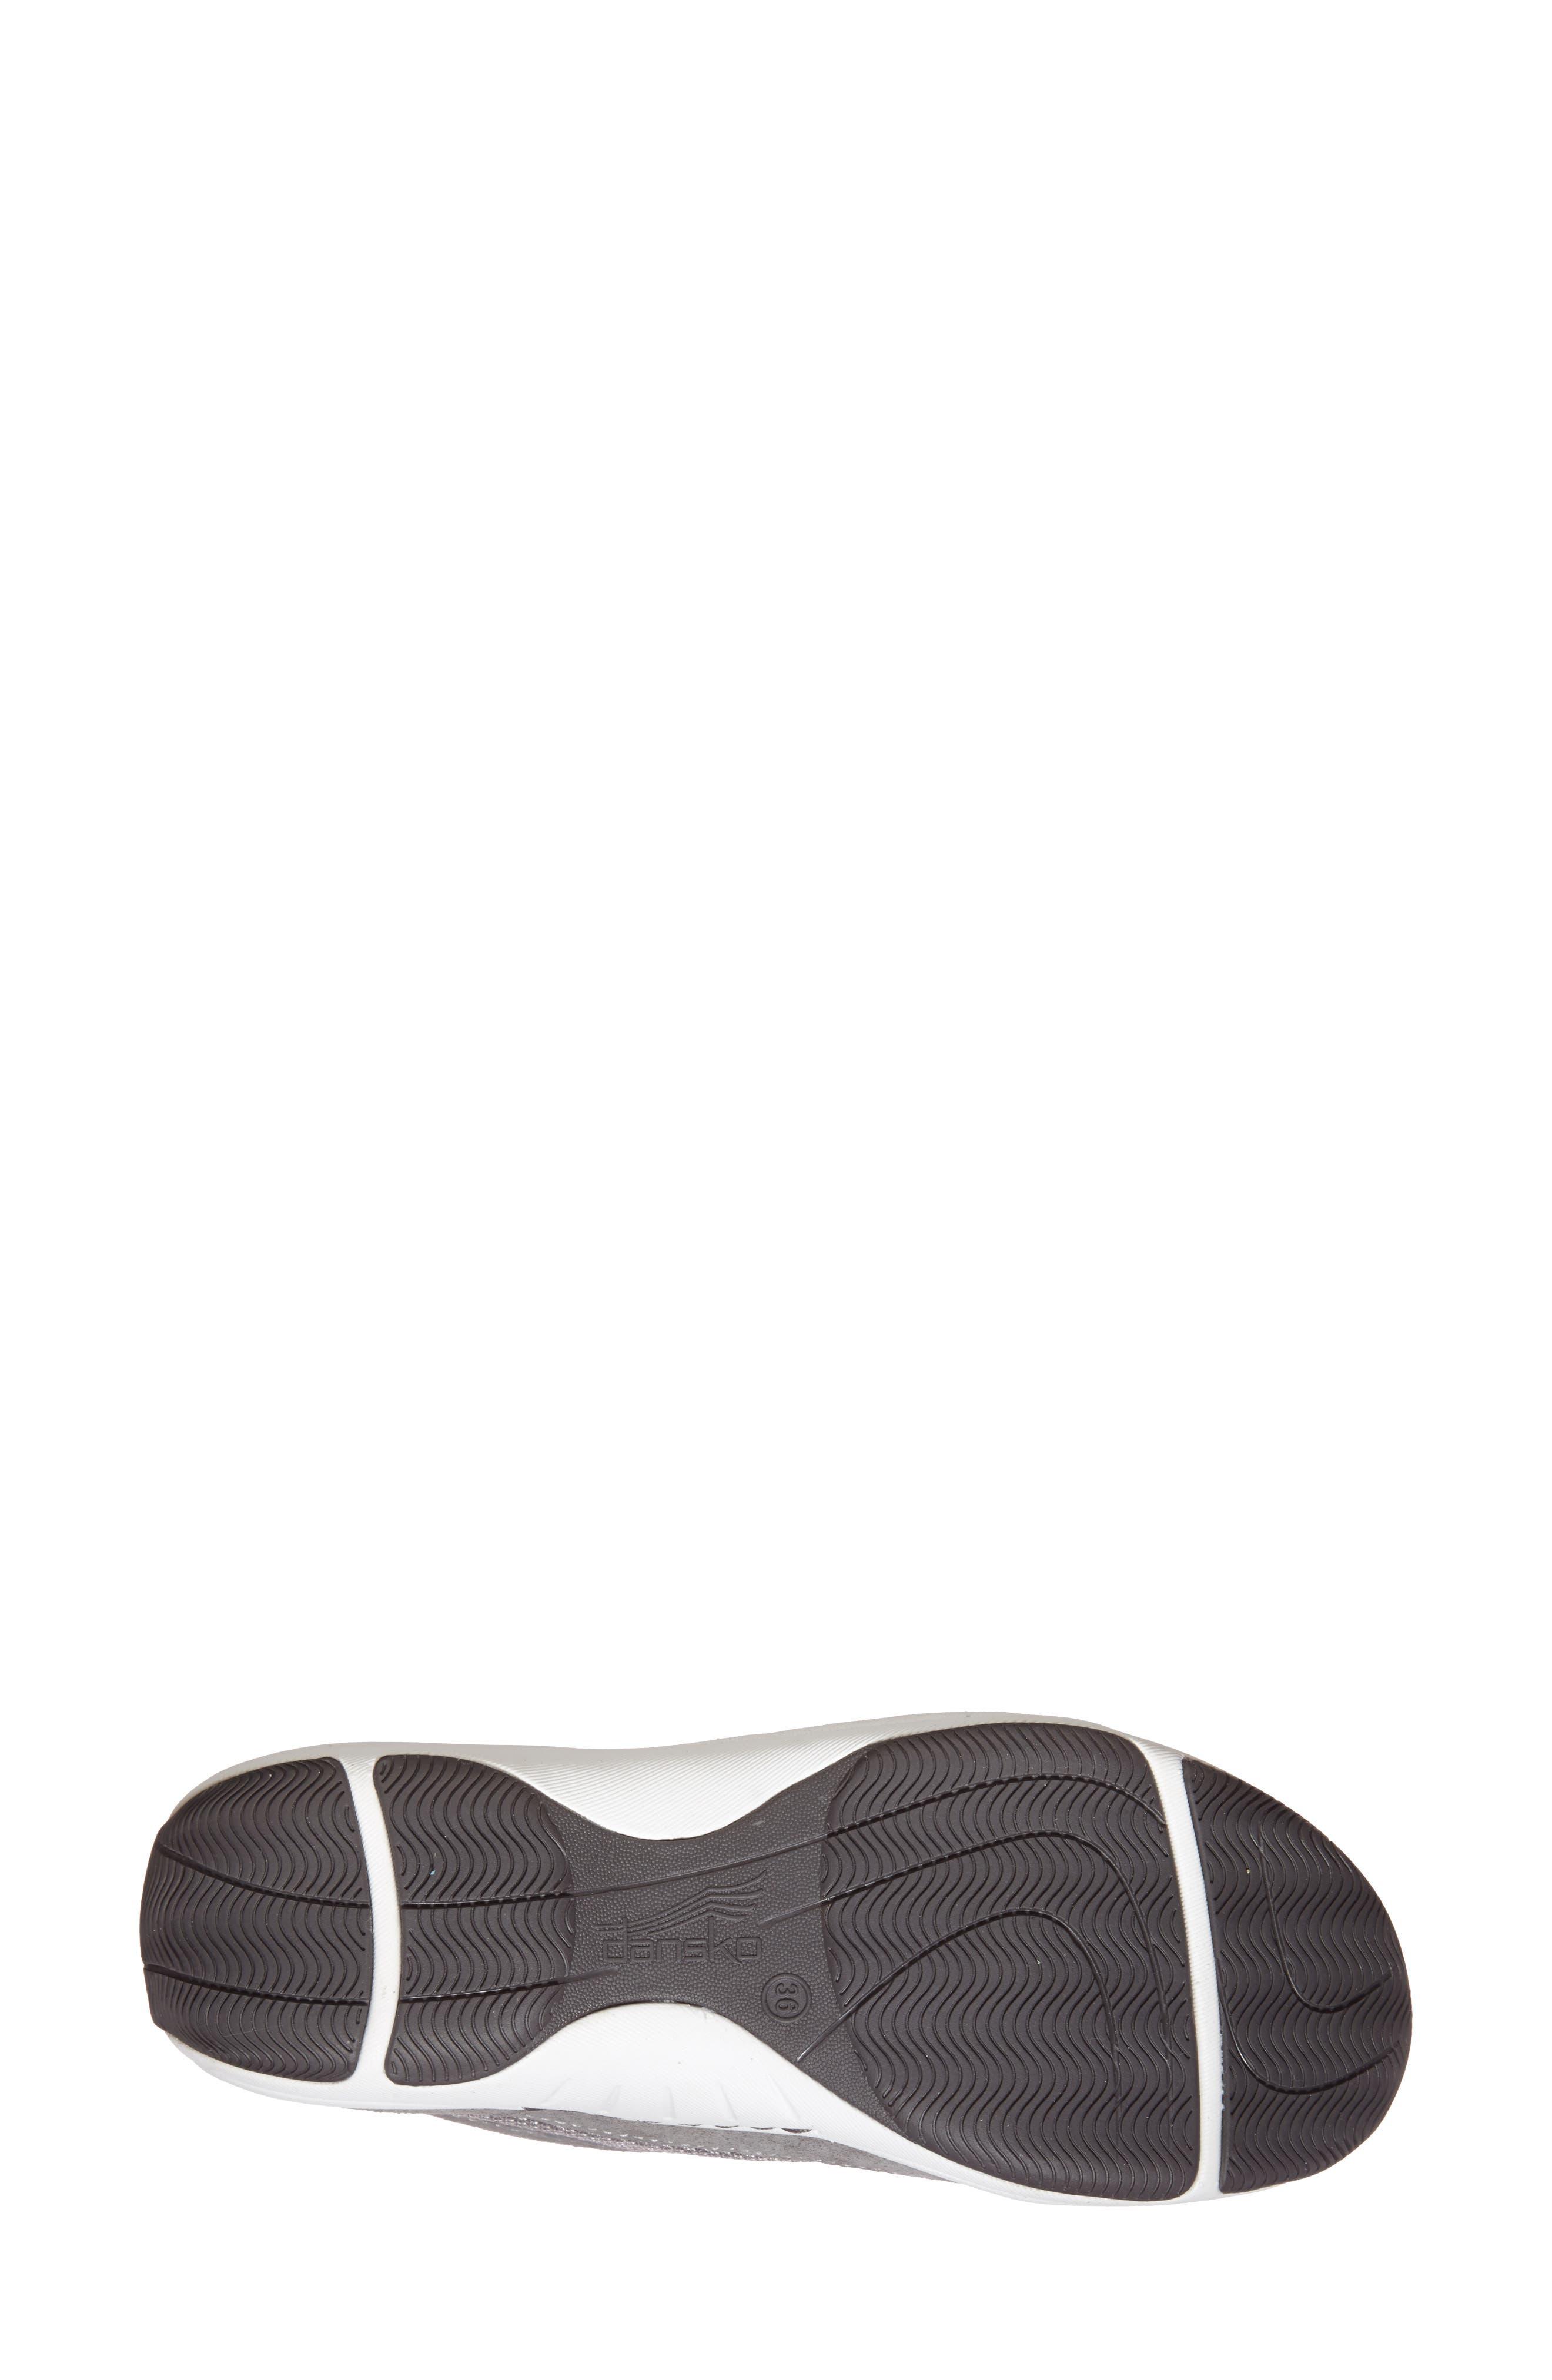 'Helen' Suede & Mesh Sneaker,                             Alternate thumbnail 65, color,